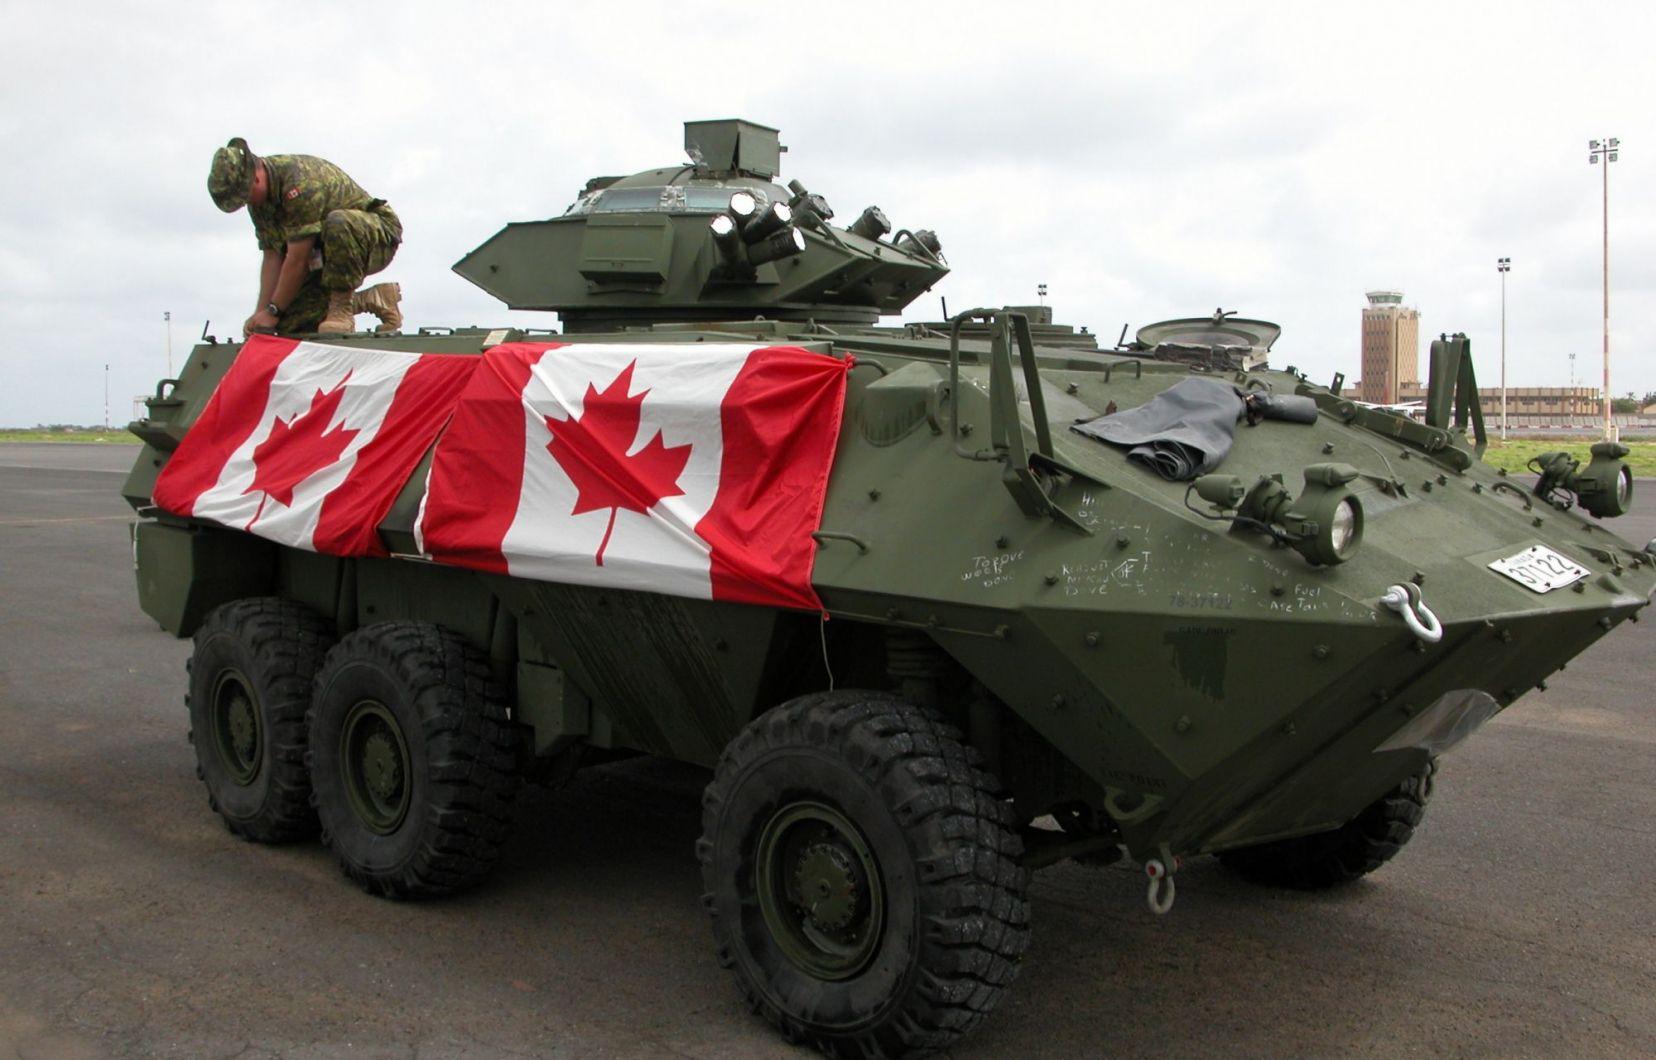 Канадская бронетехника для Украины